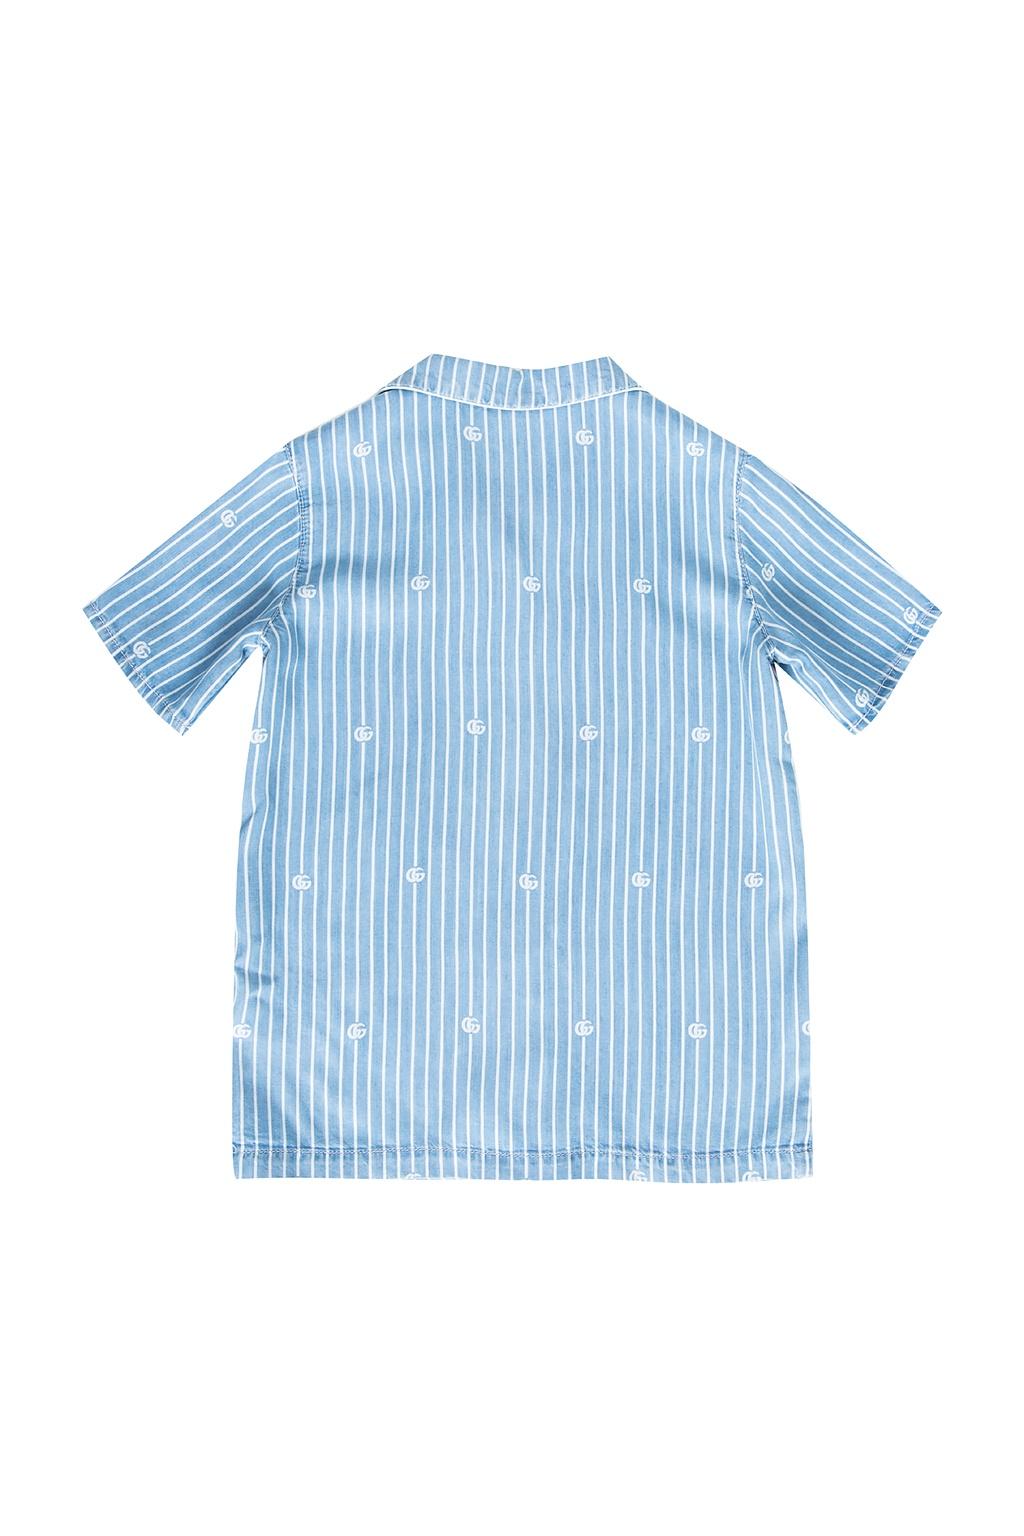 Gucci Kids Shirt with logo